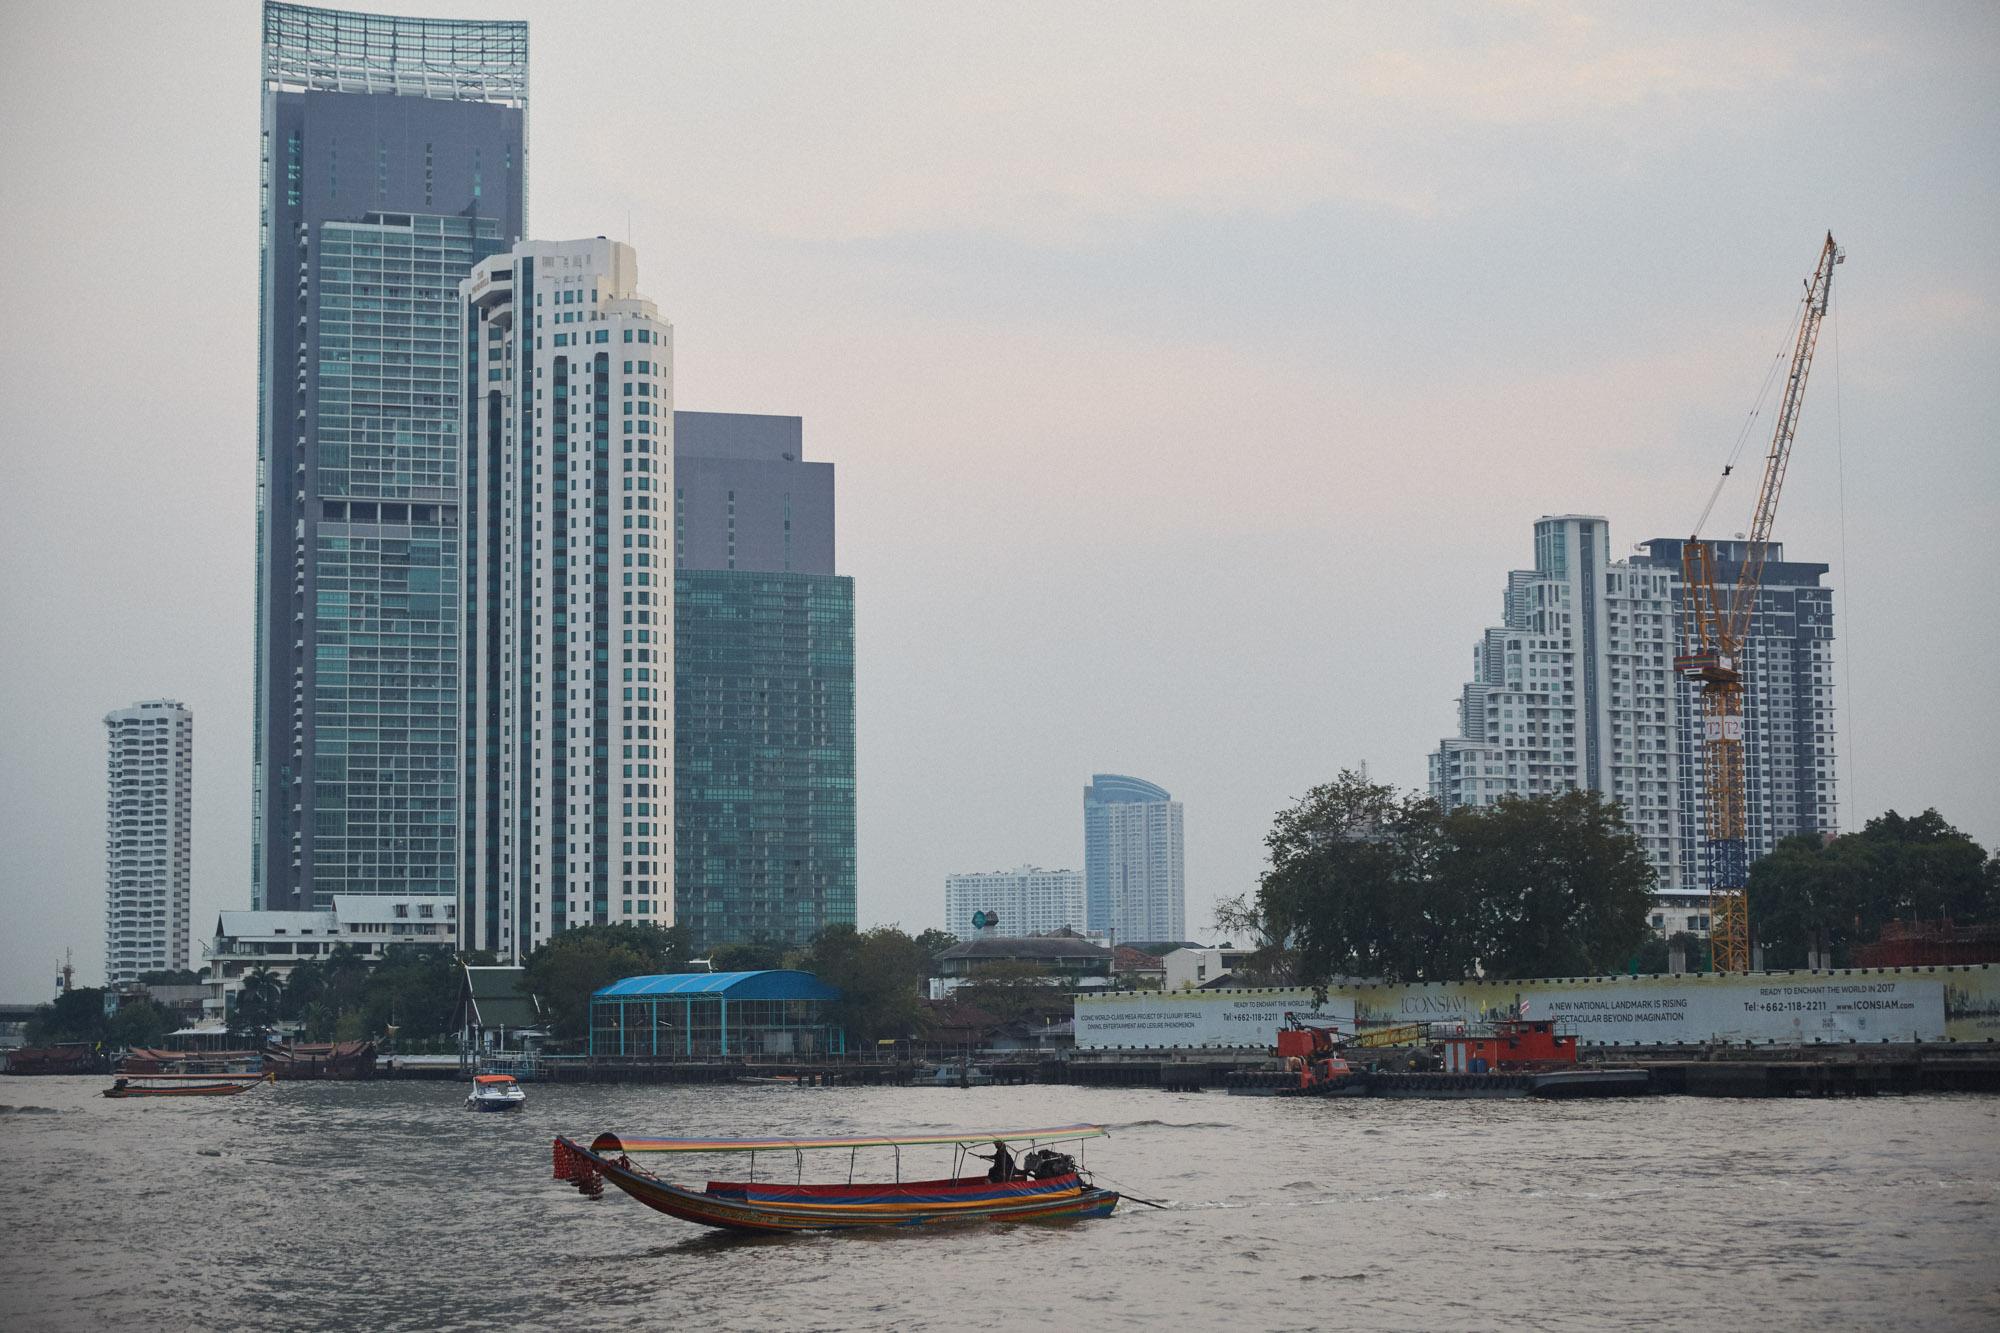 frankie_bday_thailand-3